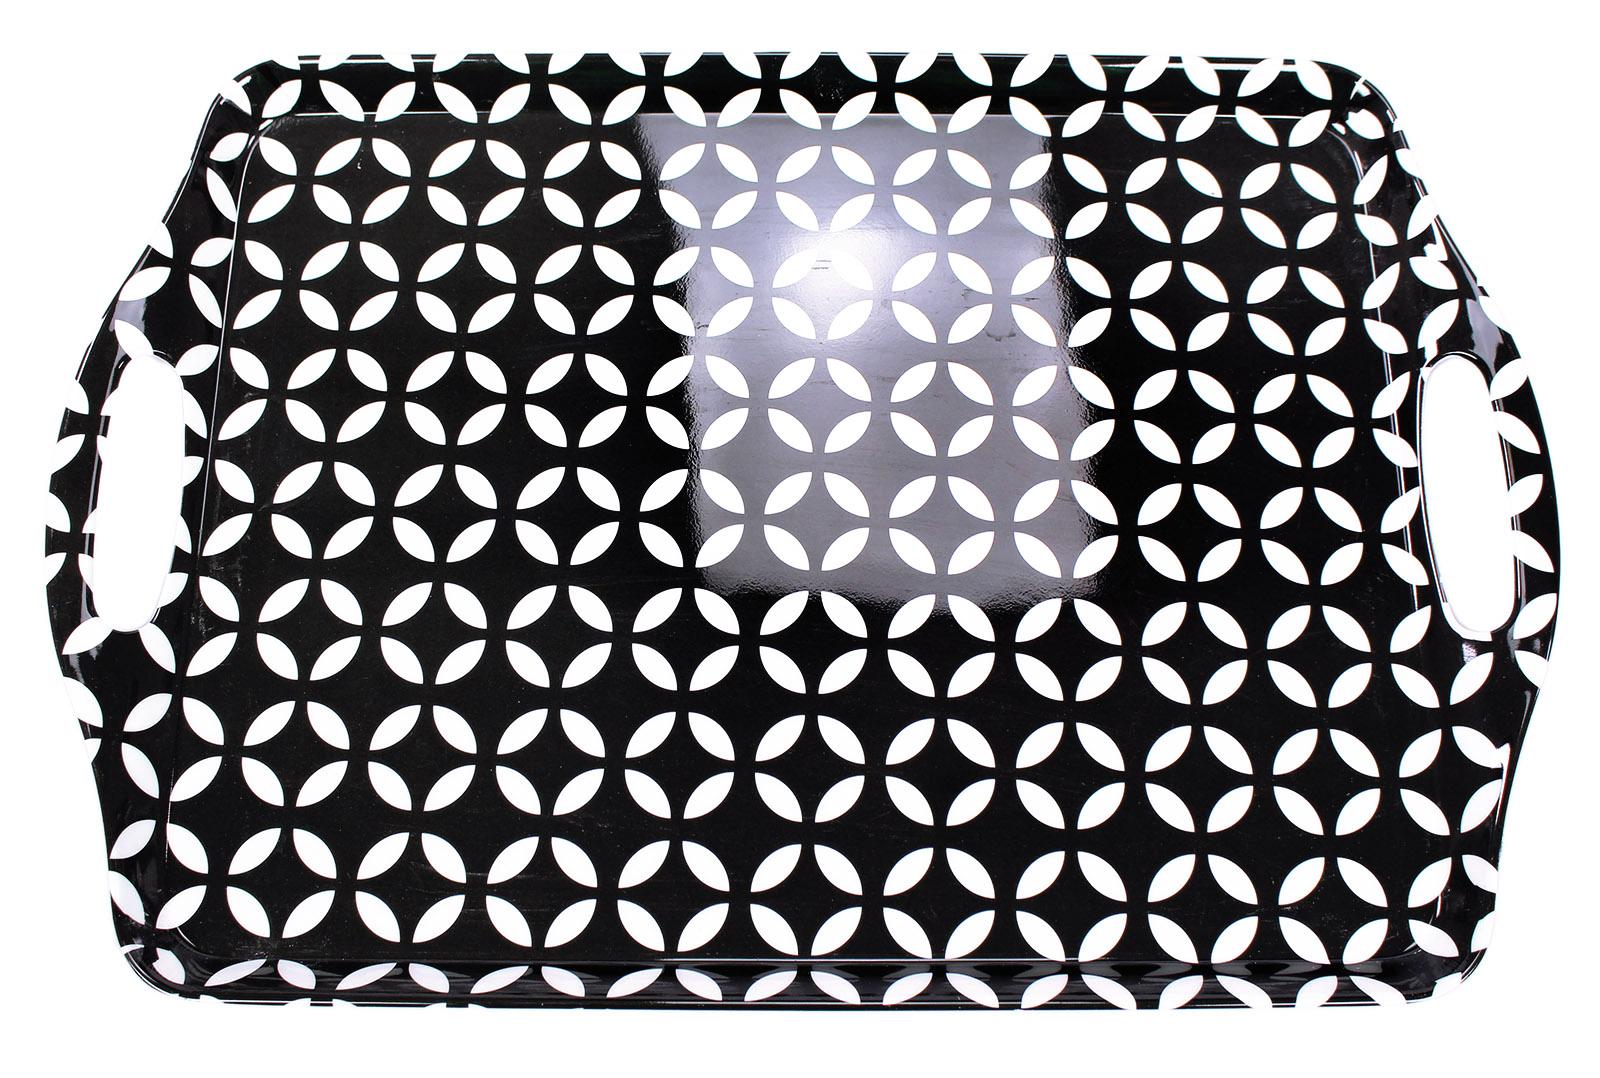 tablett melamin schwarz wei 45x30cm schwarz wei e. Black Bedroom Furniture Sets. Home Design Ideas